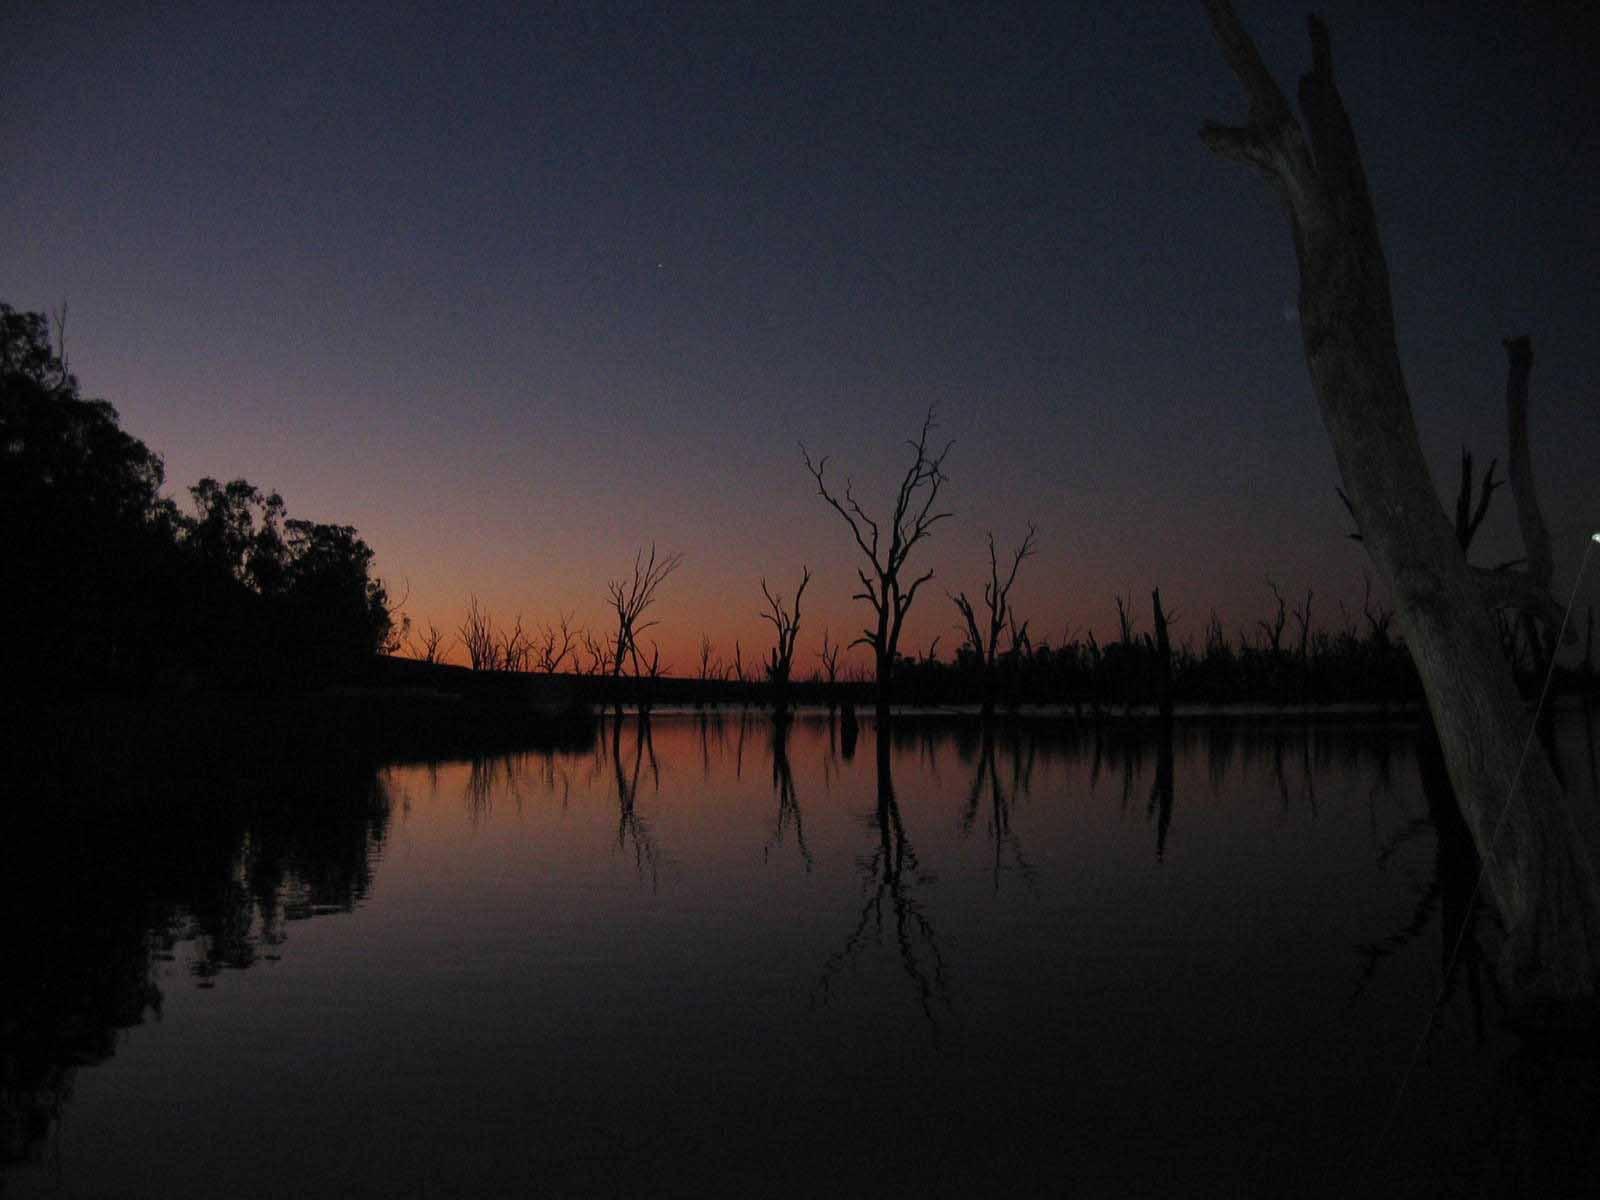 Before Moonrise